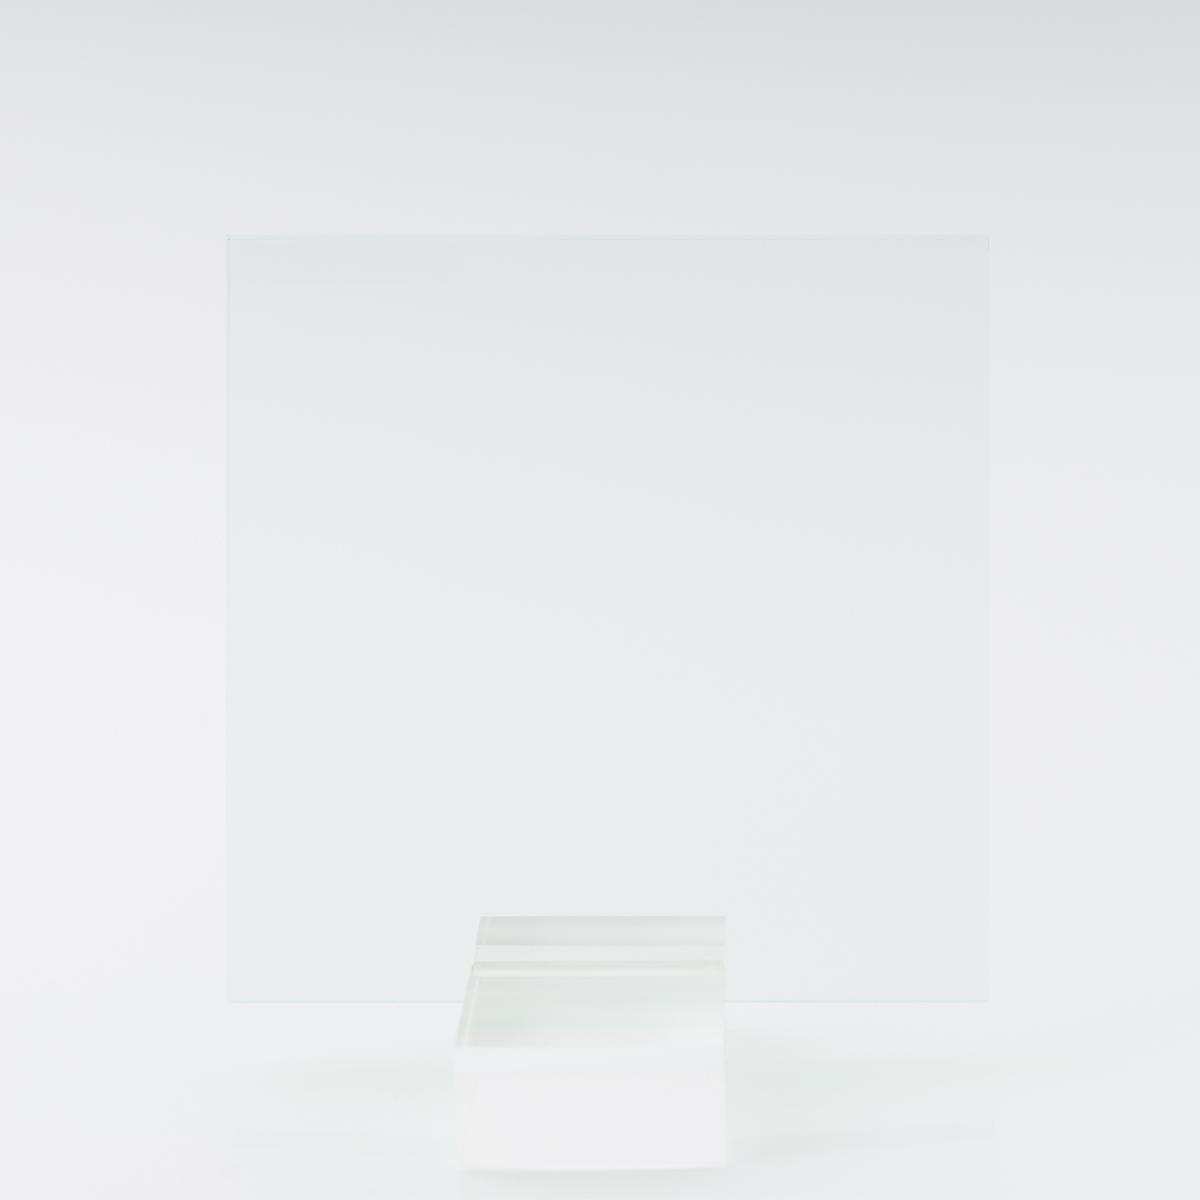 Glass Look 6t21 Perspex Acrylic Sheet Plastic Stockist